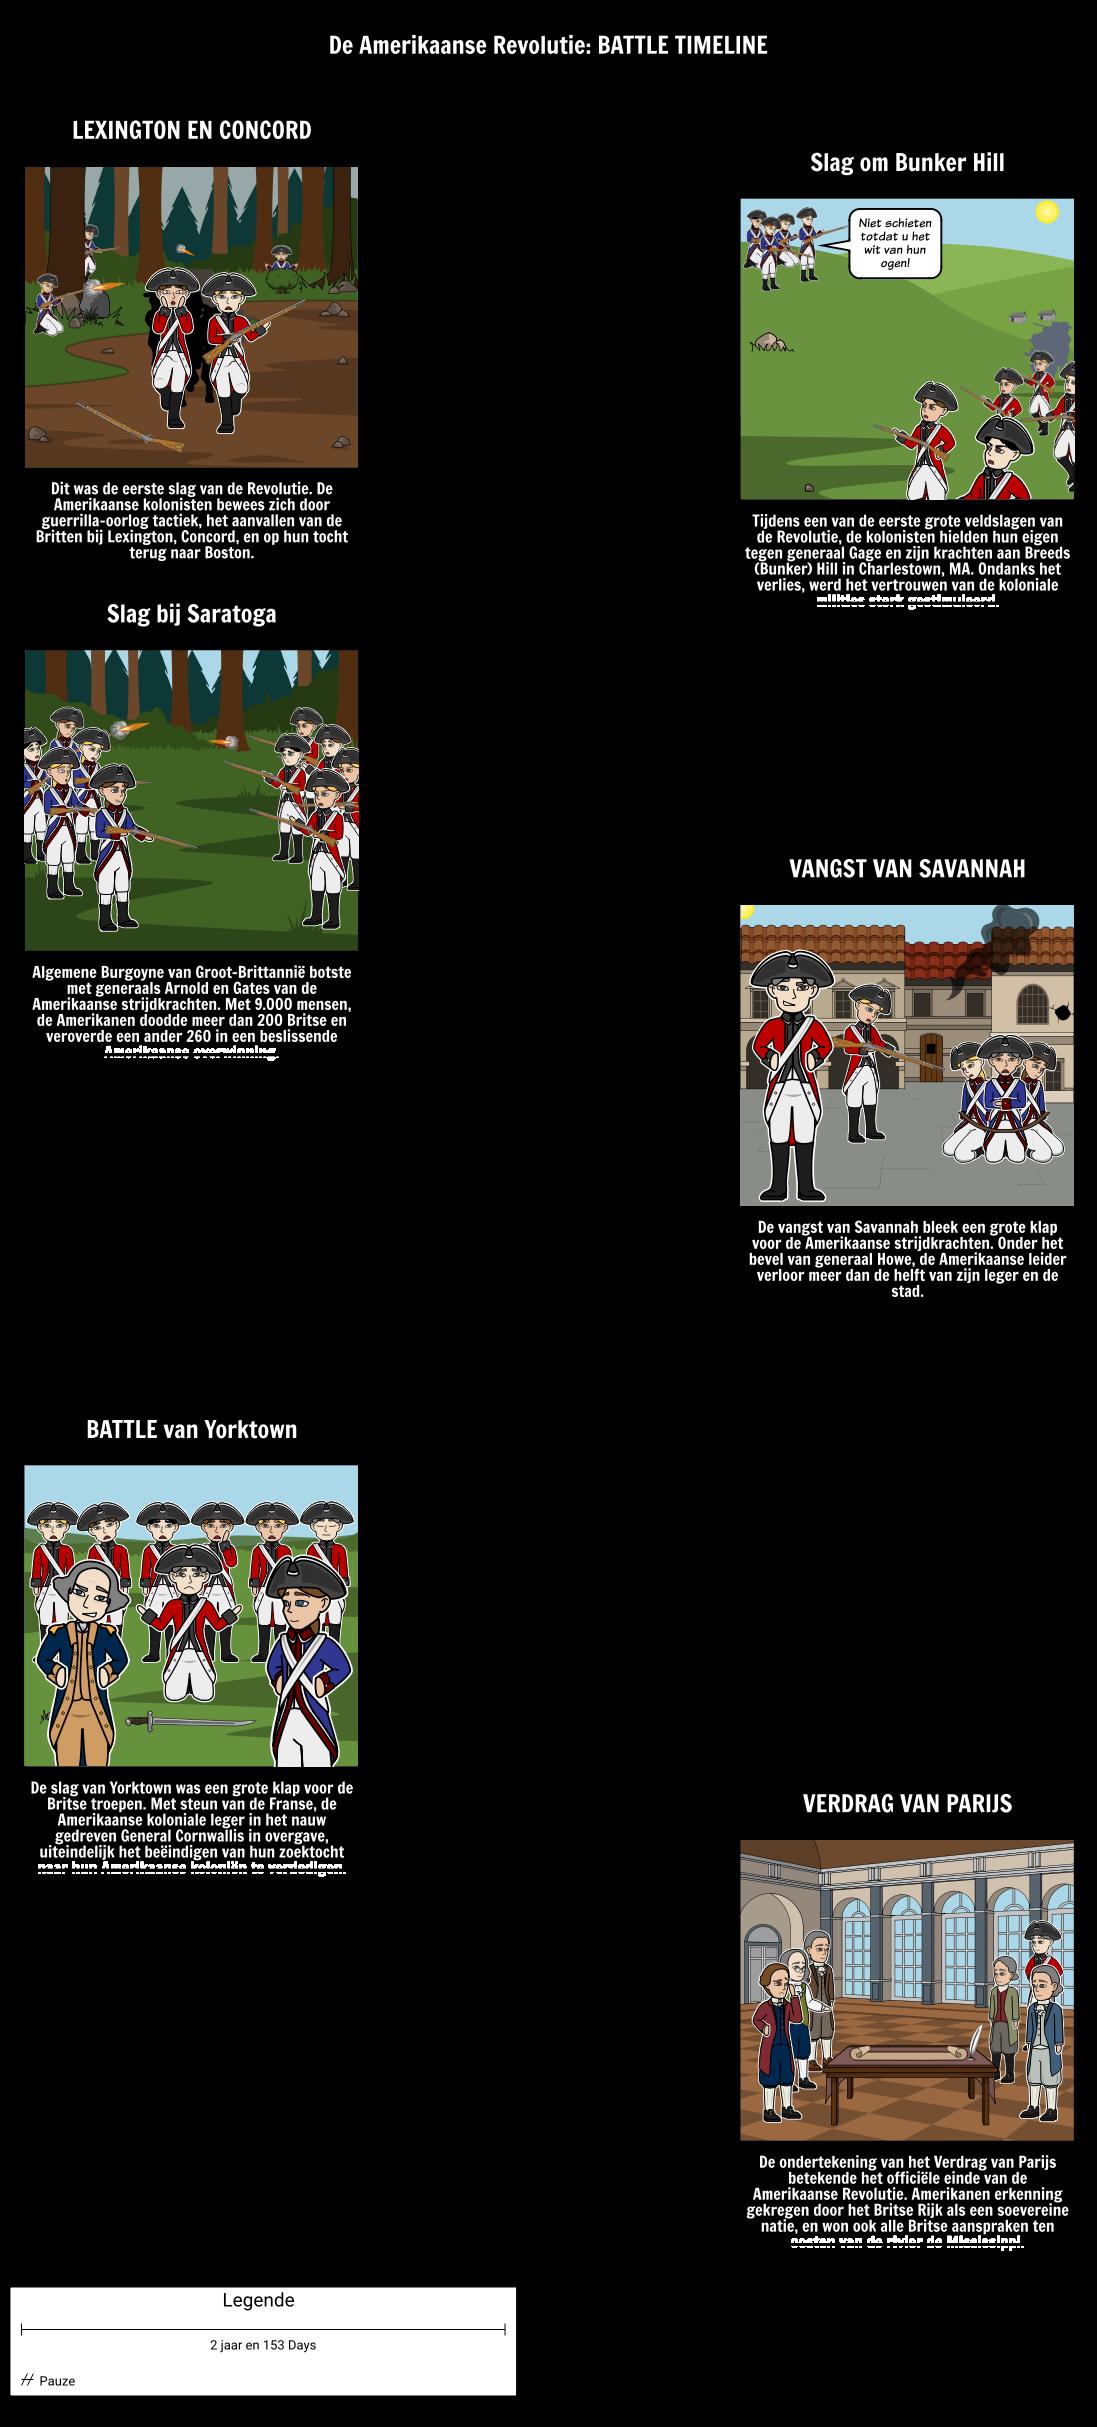 The American Revolution Timeline: Battles